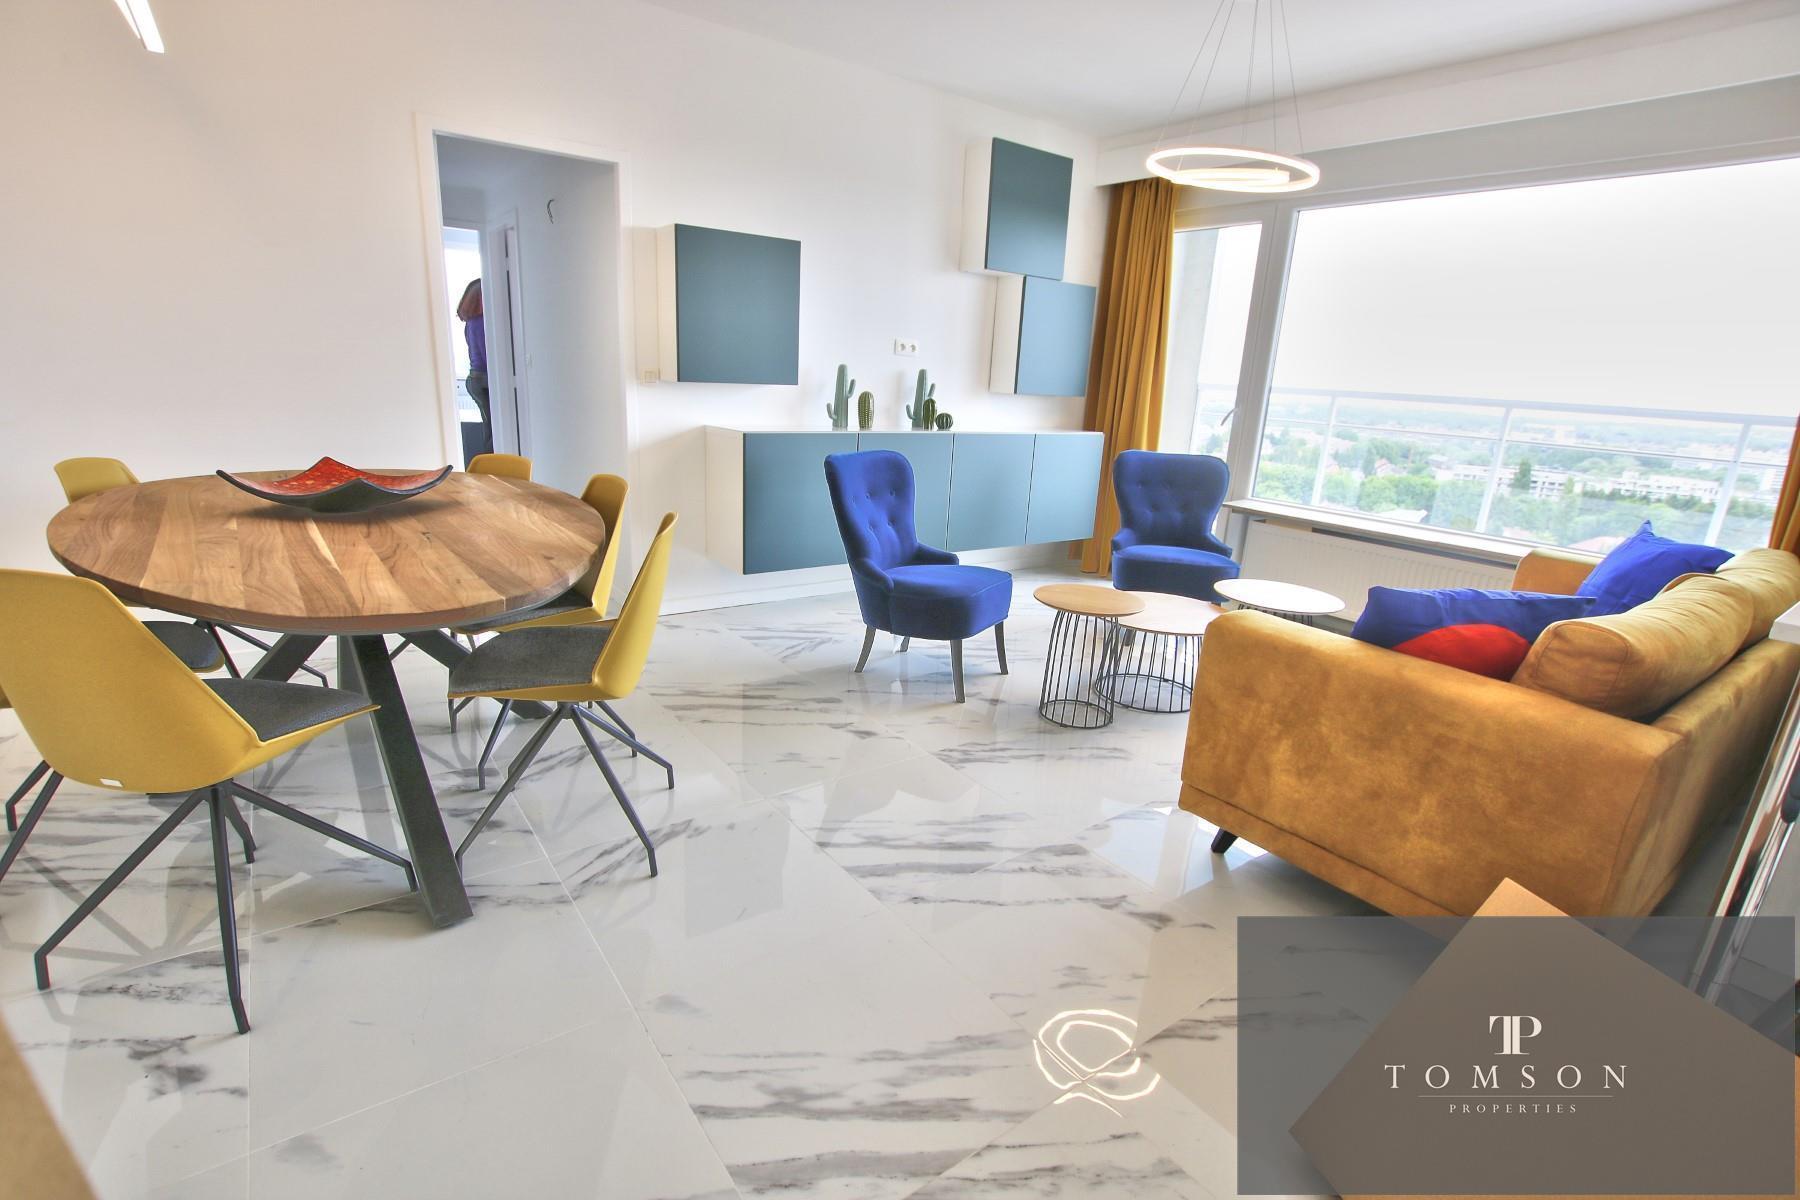 Appartement - Woluwe-Saint-Lambert - #4115211-0